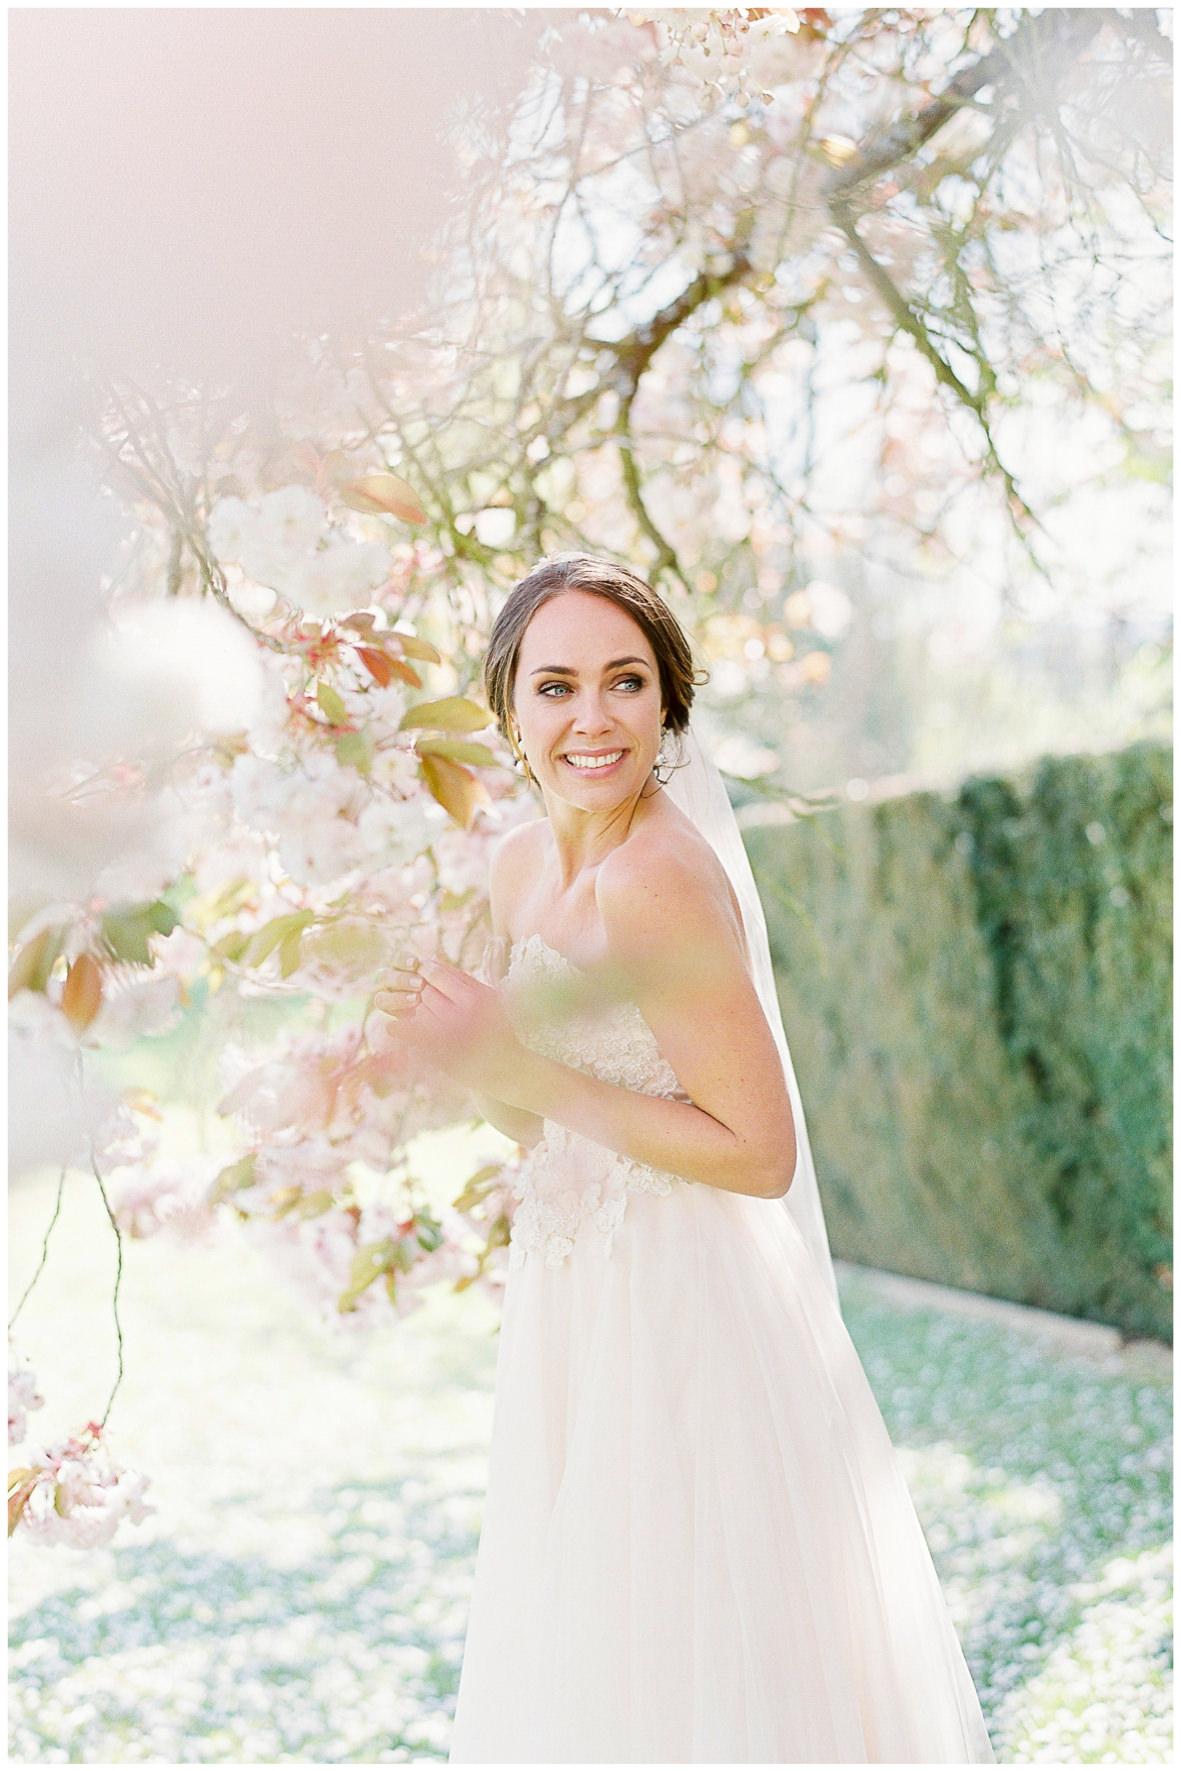 Lucy Davenport Photography, Holdenby House, wedding venue, Northamptonshire, The Couture Gallery, wedding dress, coloured wedding dress, blush pink wedding dress, veil, bridal headpiece